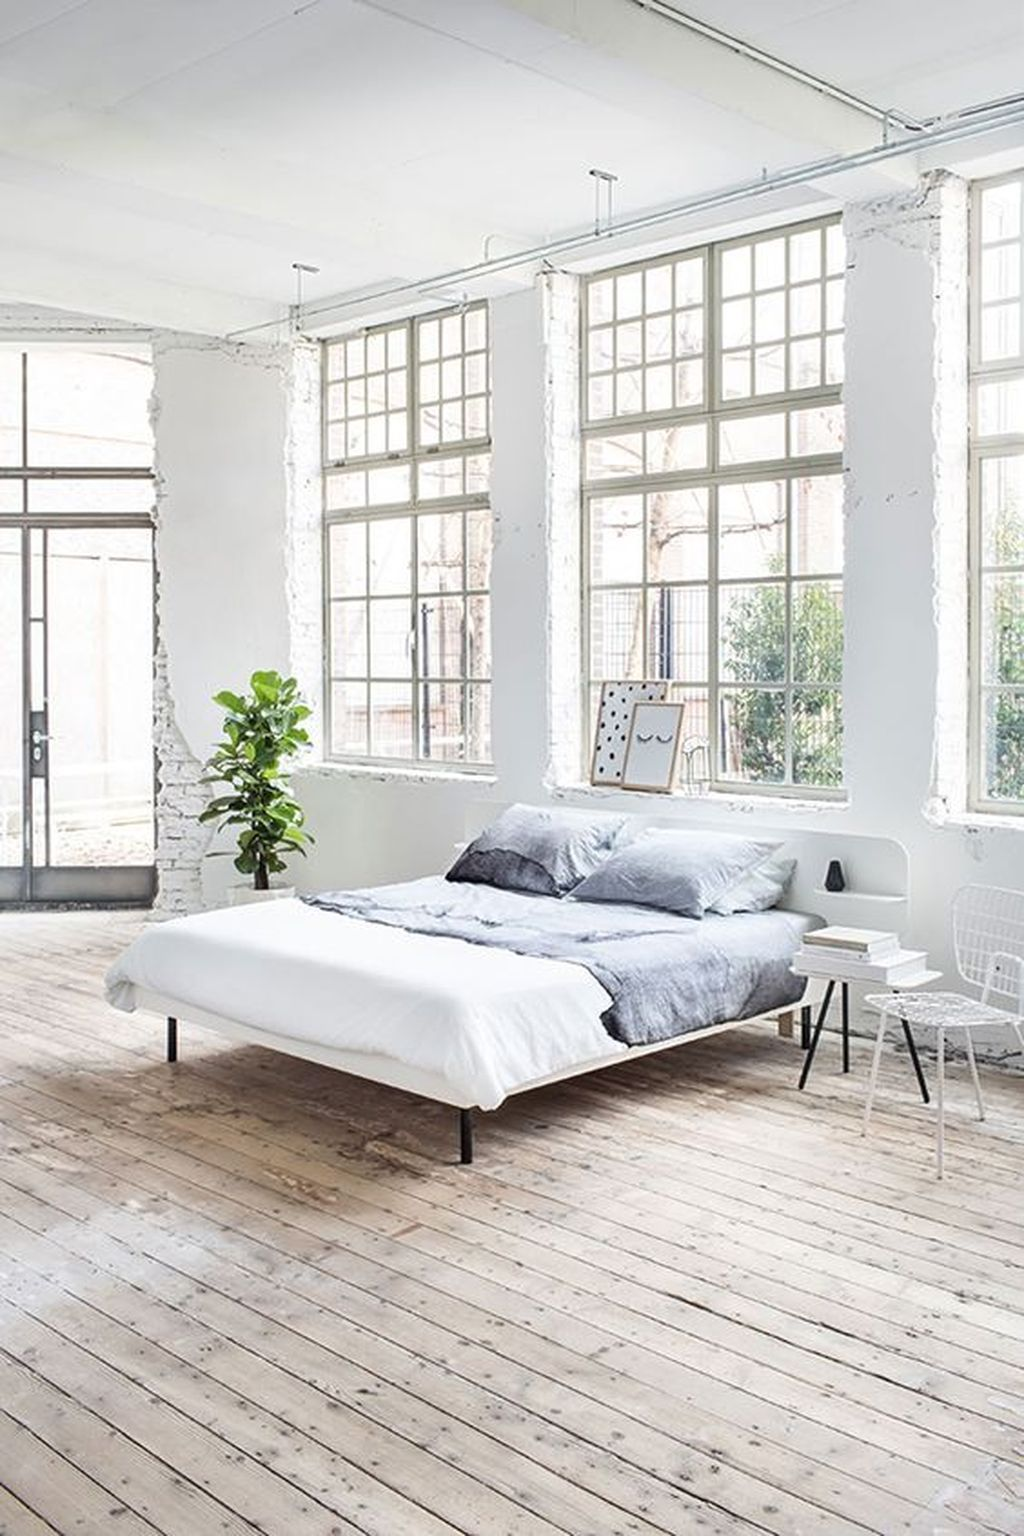 Loft bedroom style   Stunning Loft Style Bedroom Design Ideas  Loft style bedroom